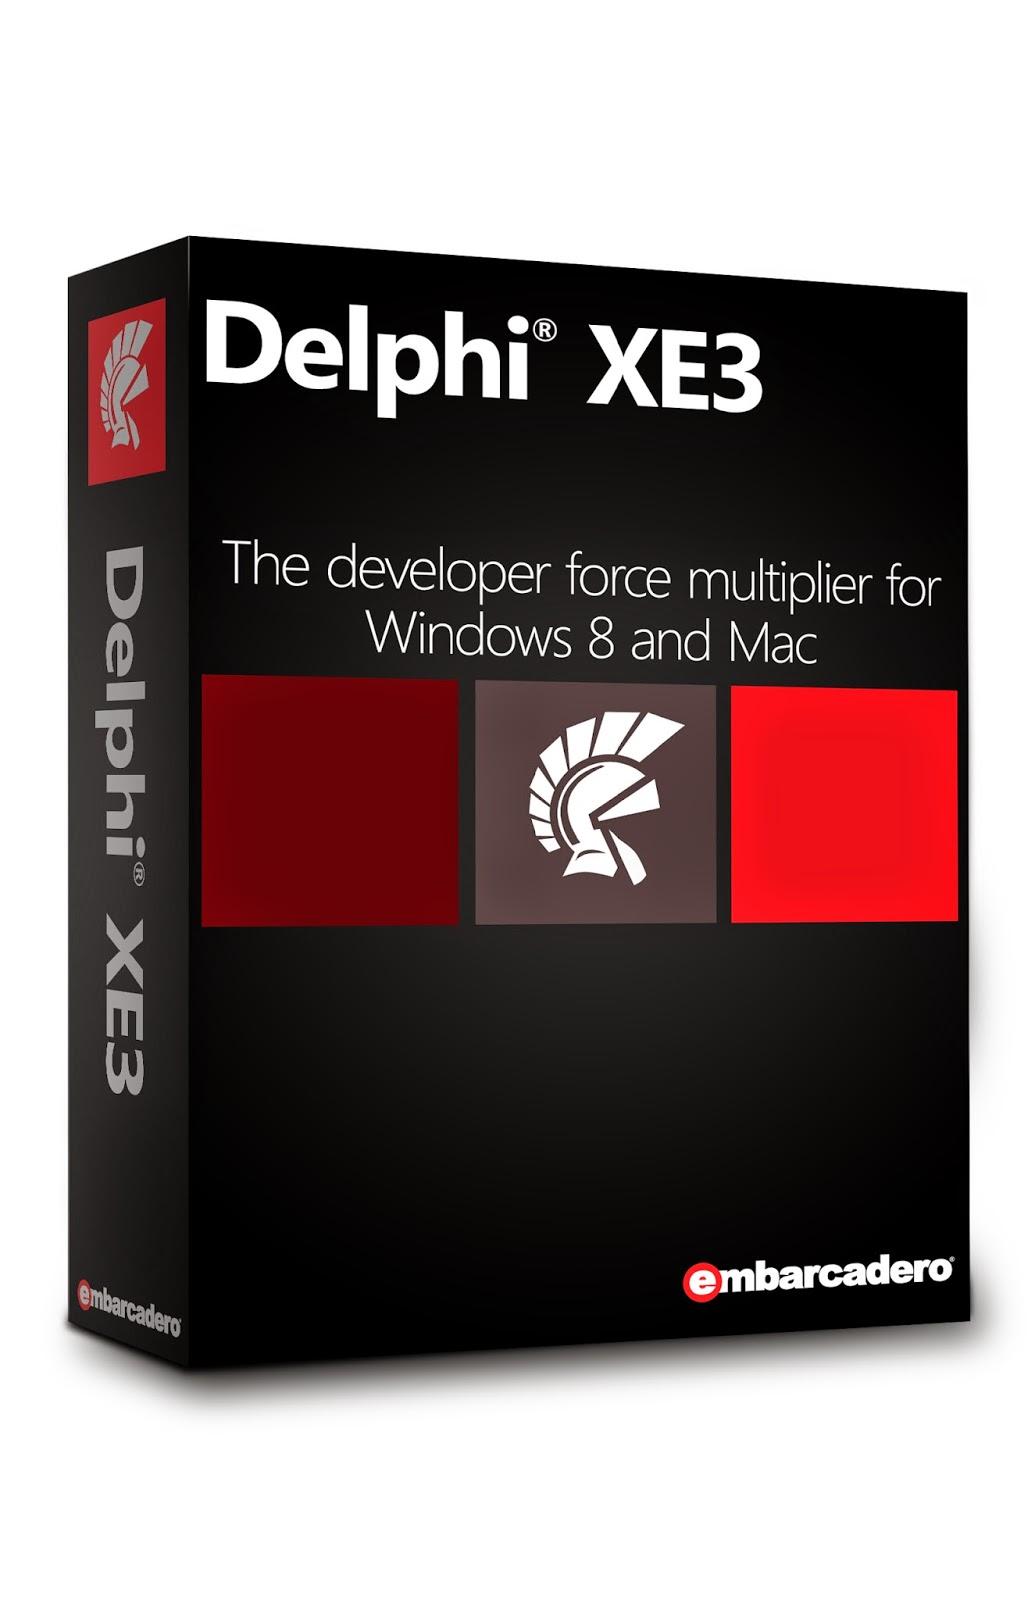 Delphi XE3